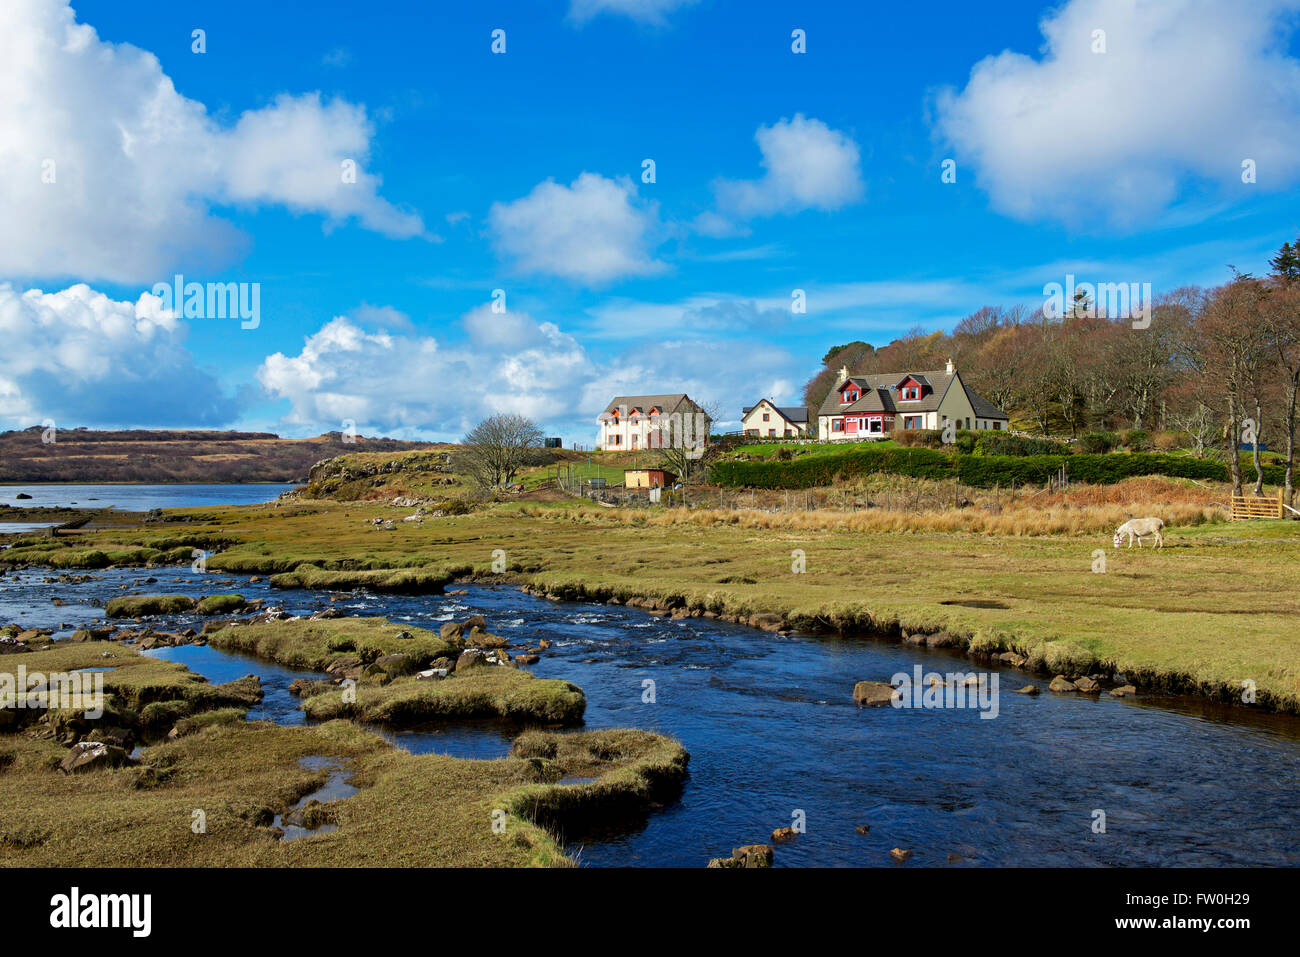 The village of Dervaig, Isle of Mull, Inner Hebrides, Scotland UK - Stock Image